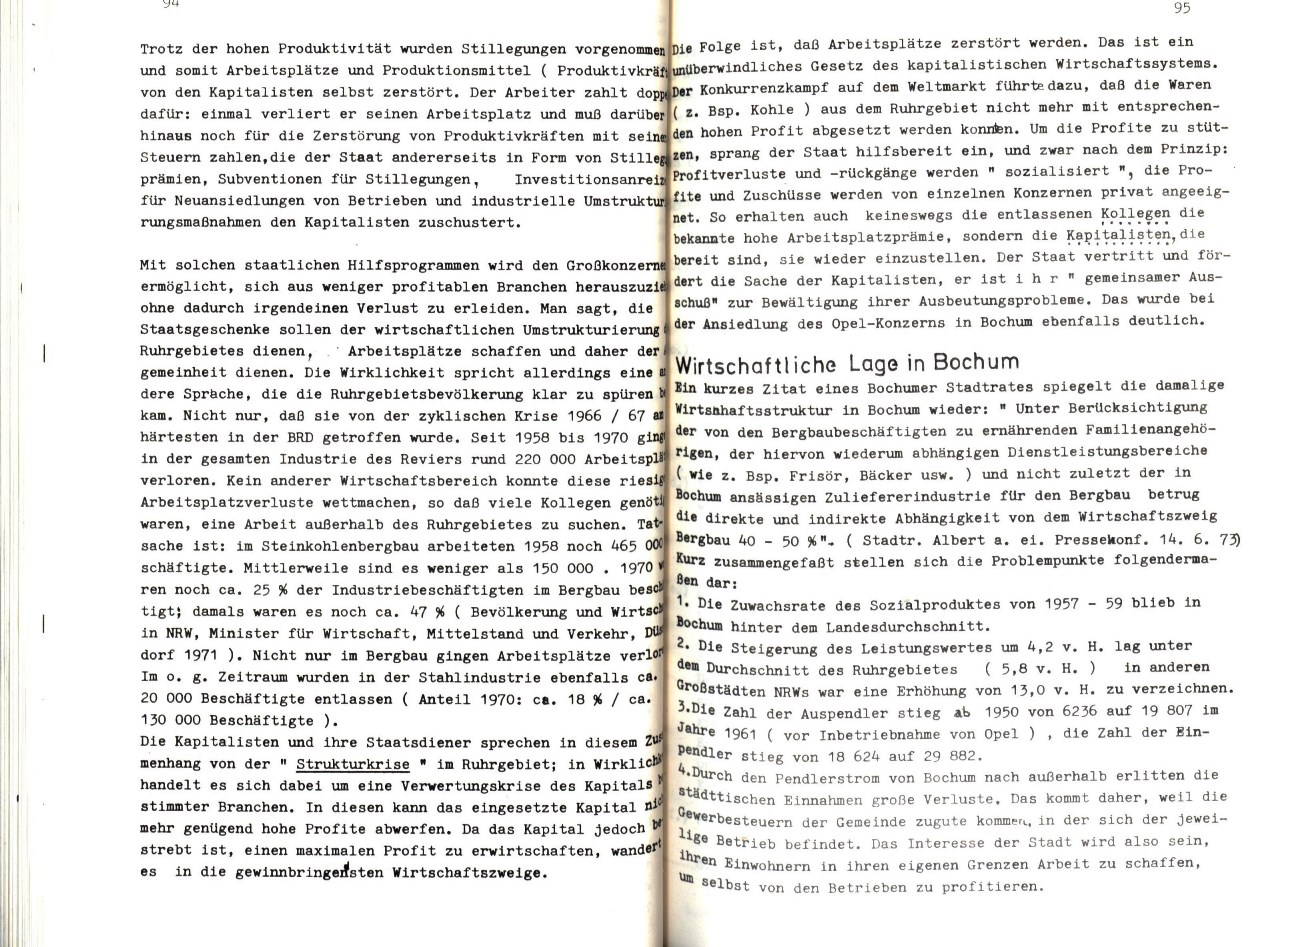 Bochum_IGM_Opel_PG_Opel_streikt_1973_049